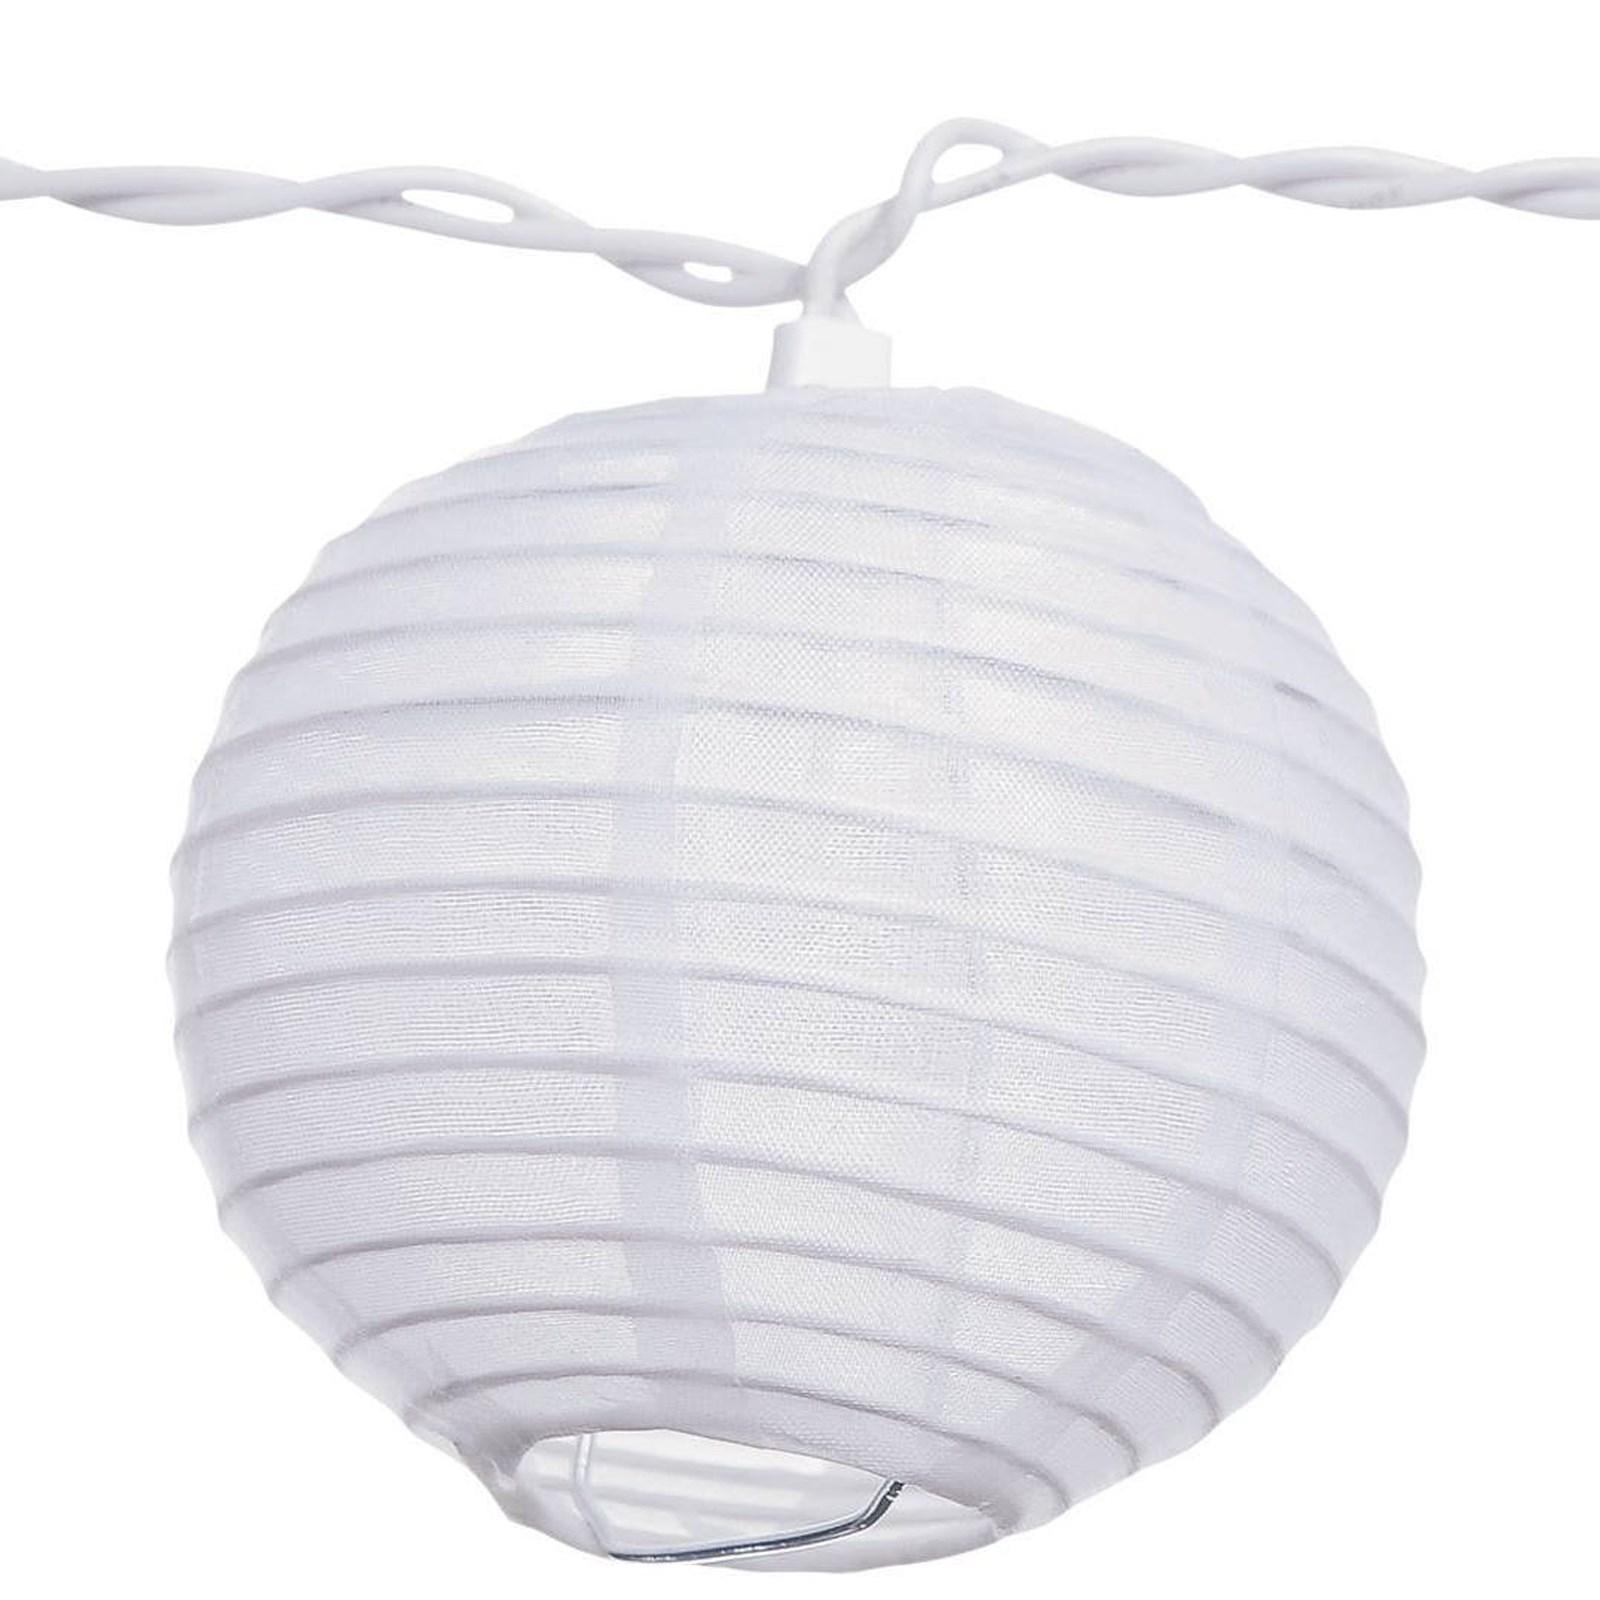 Round Lantern String Lights : Round Lantern String Lights (11 Feet Long) BuyCostumes.com